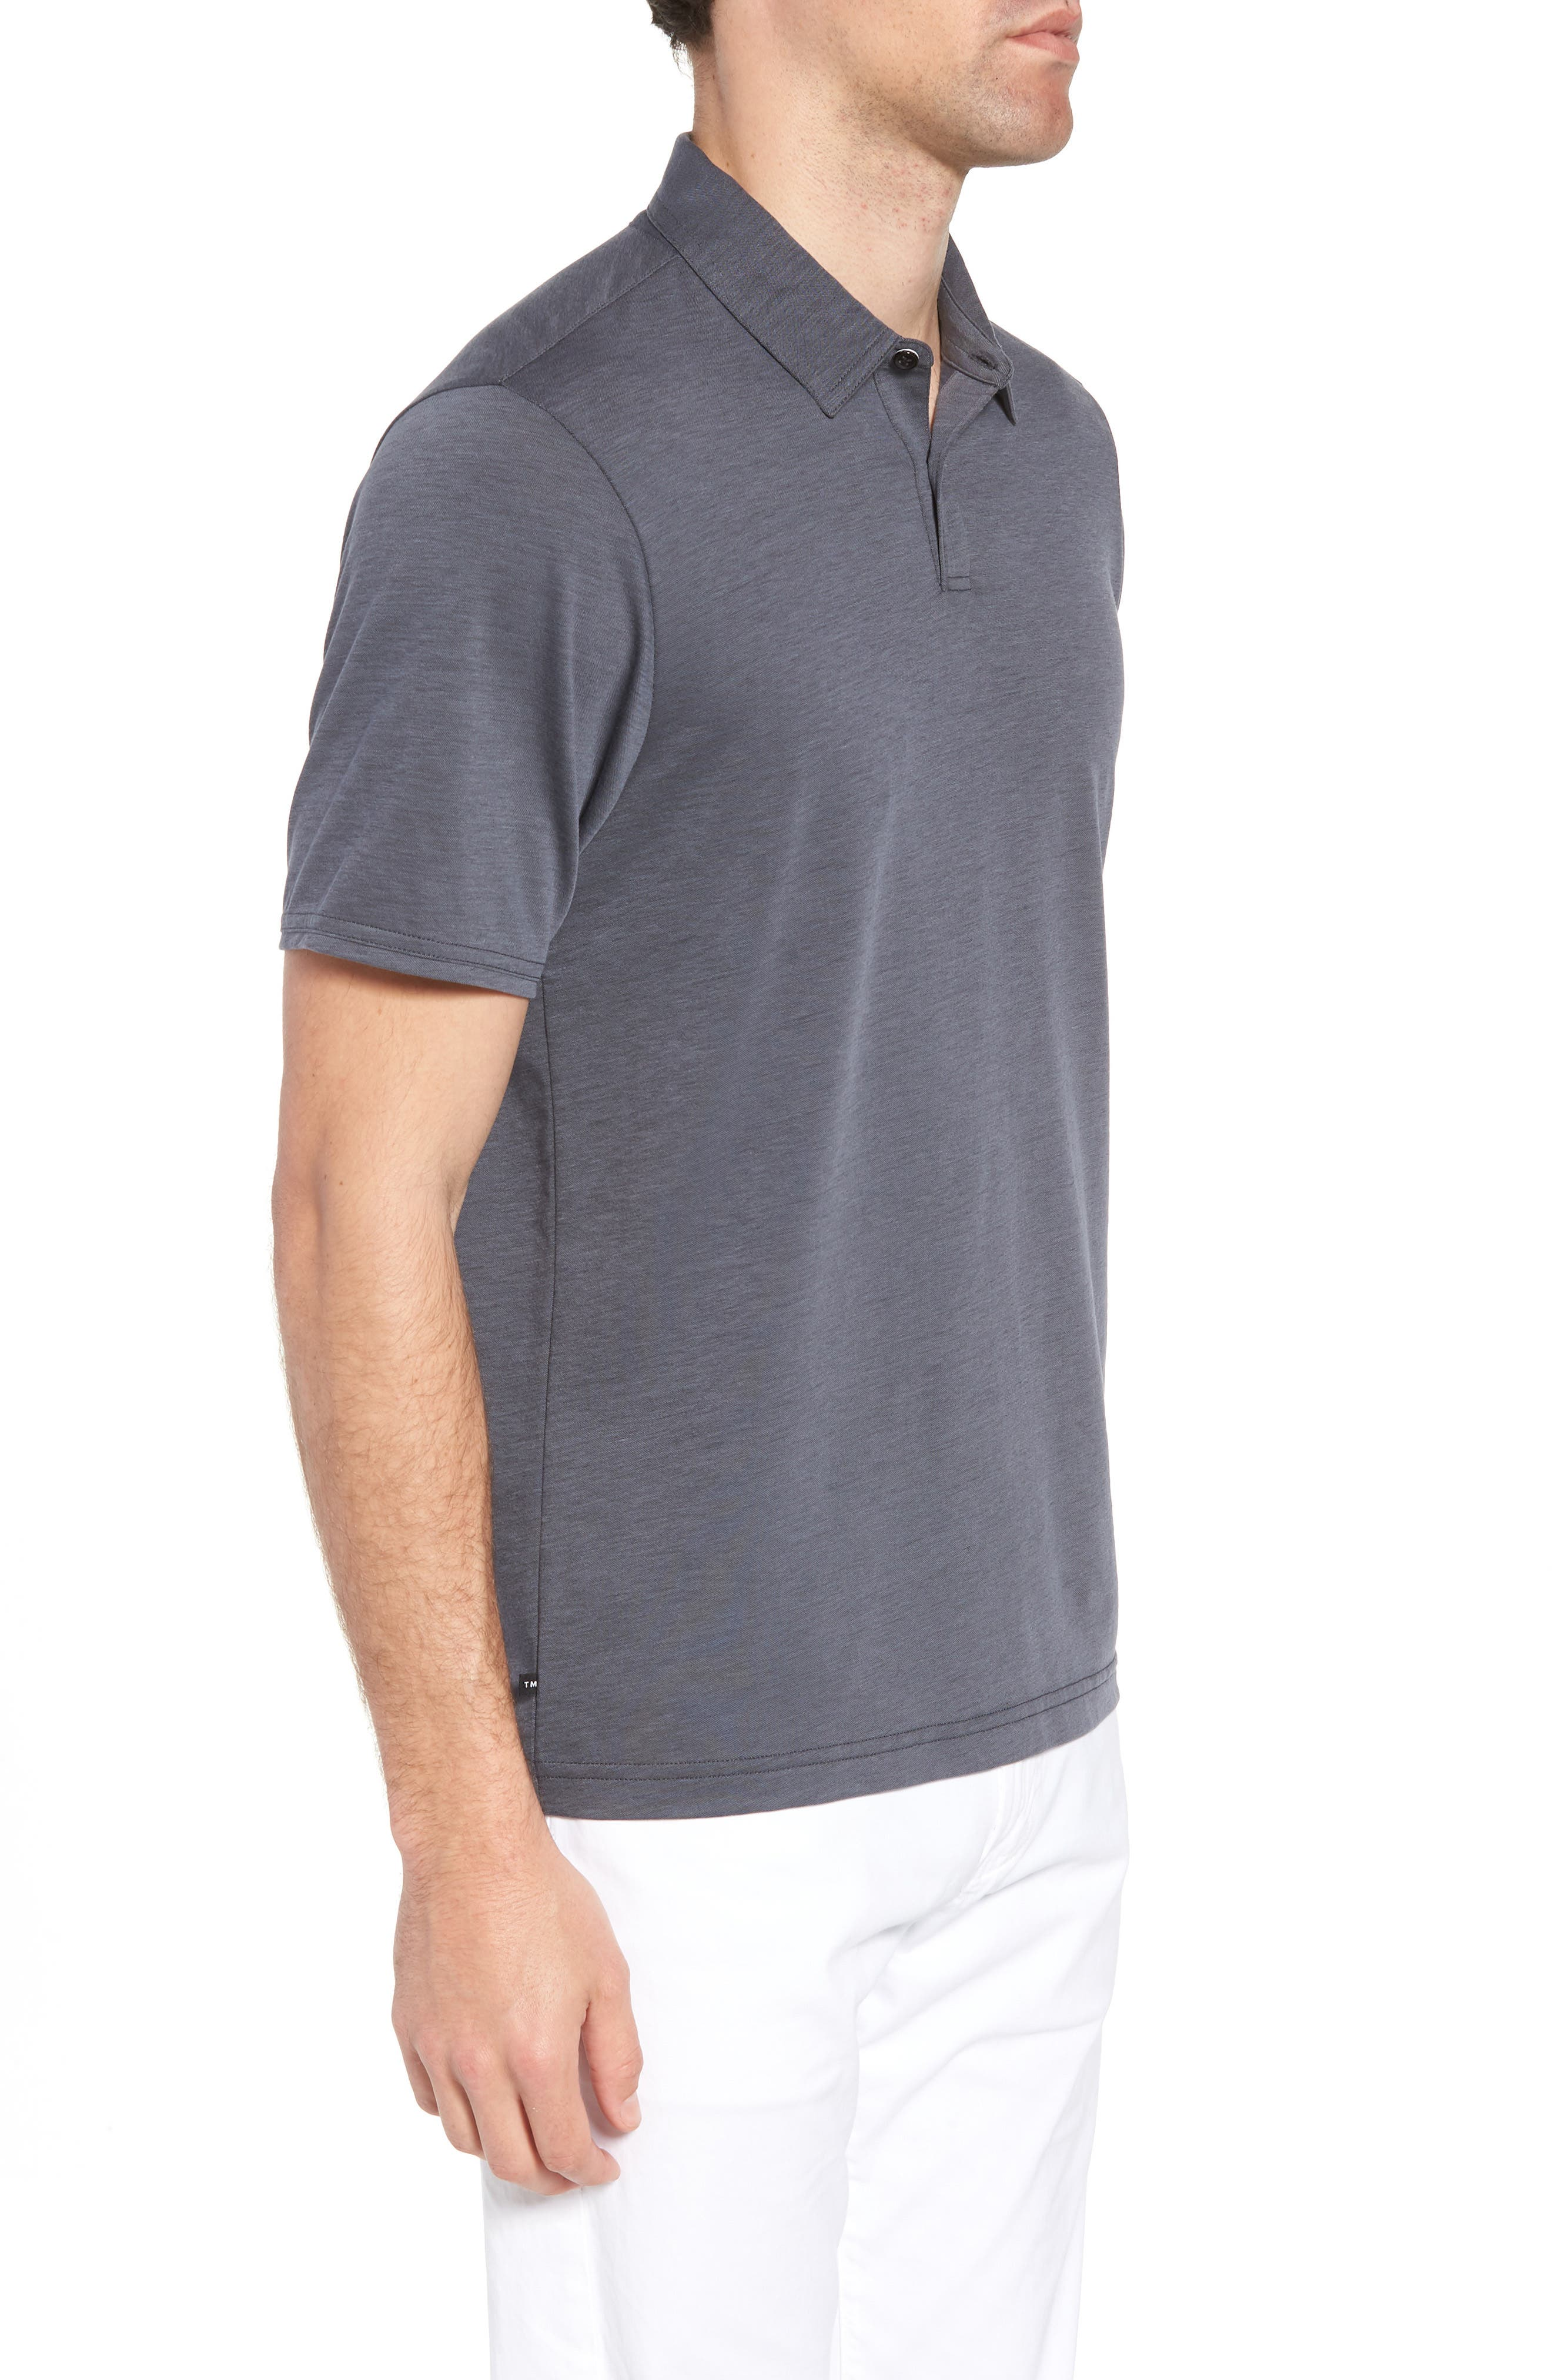 Shalene Regular Fit Polo,                             Alternate thumbnail 3, color,                             Grisaille/ Black